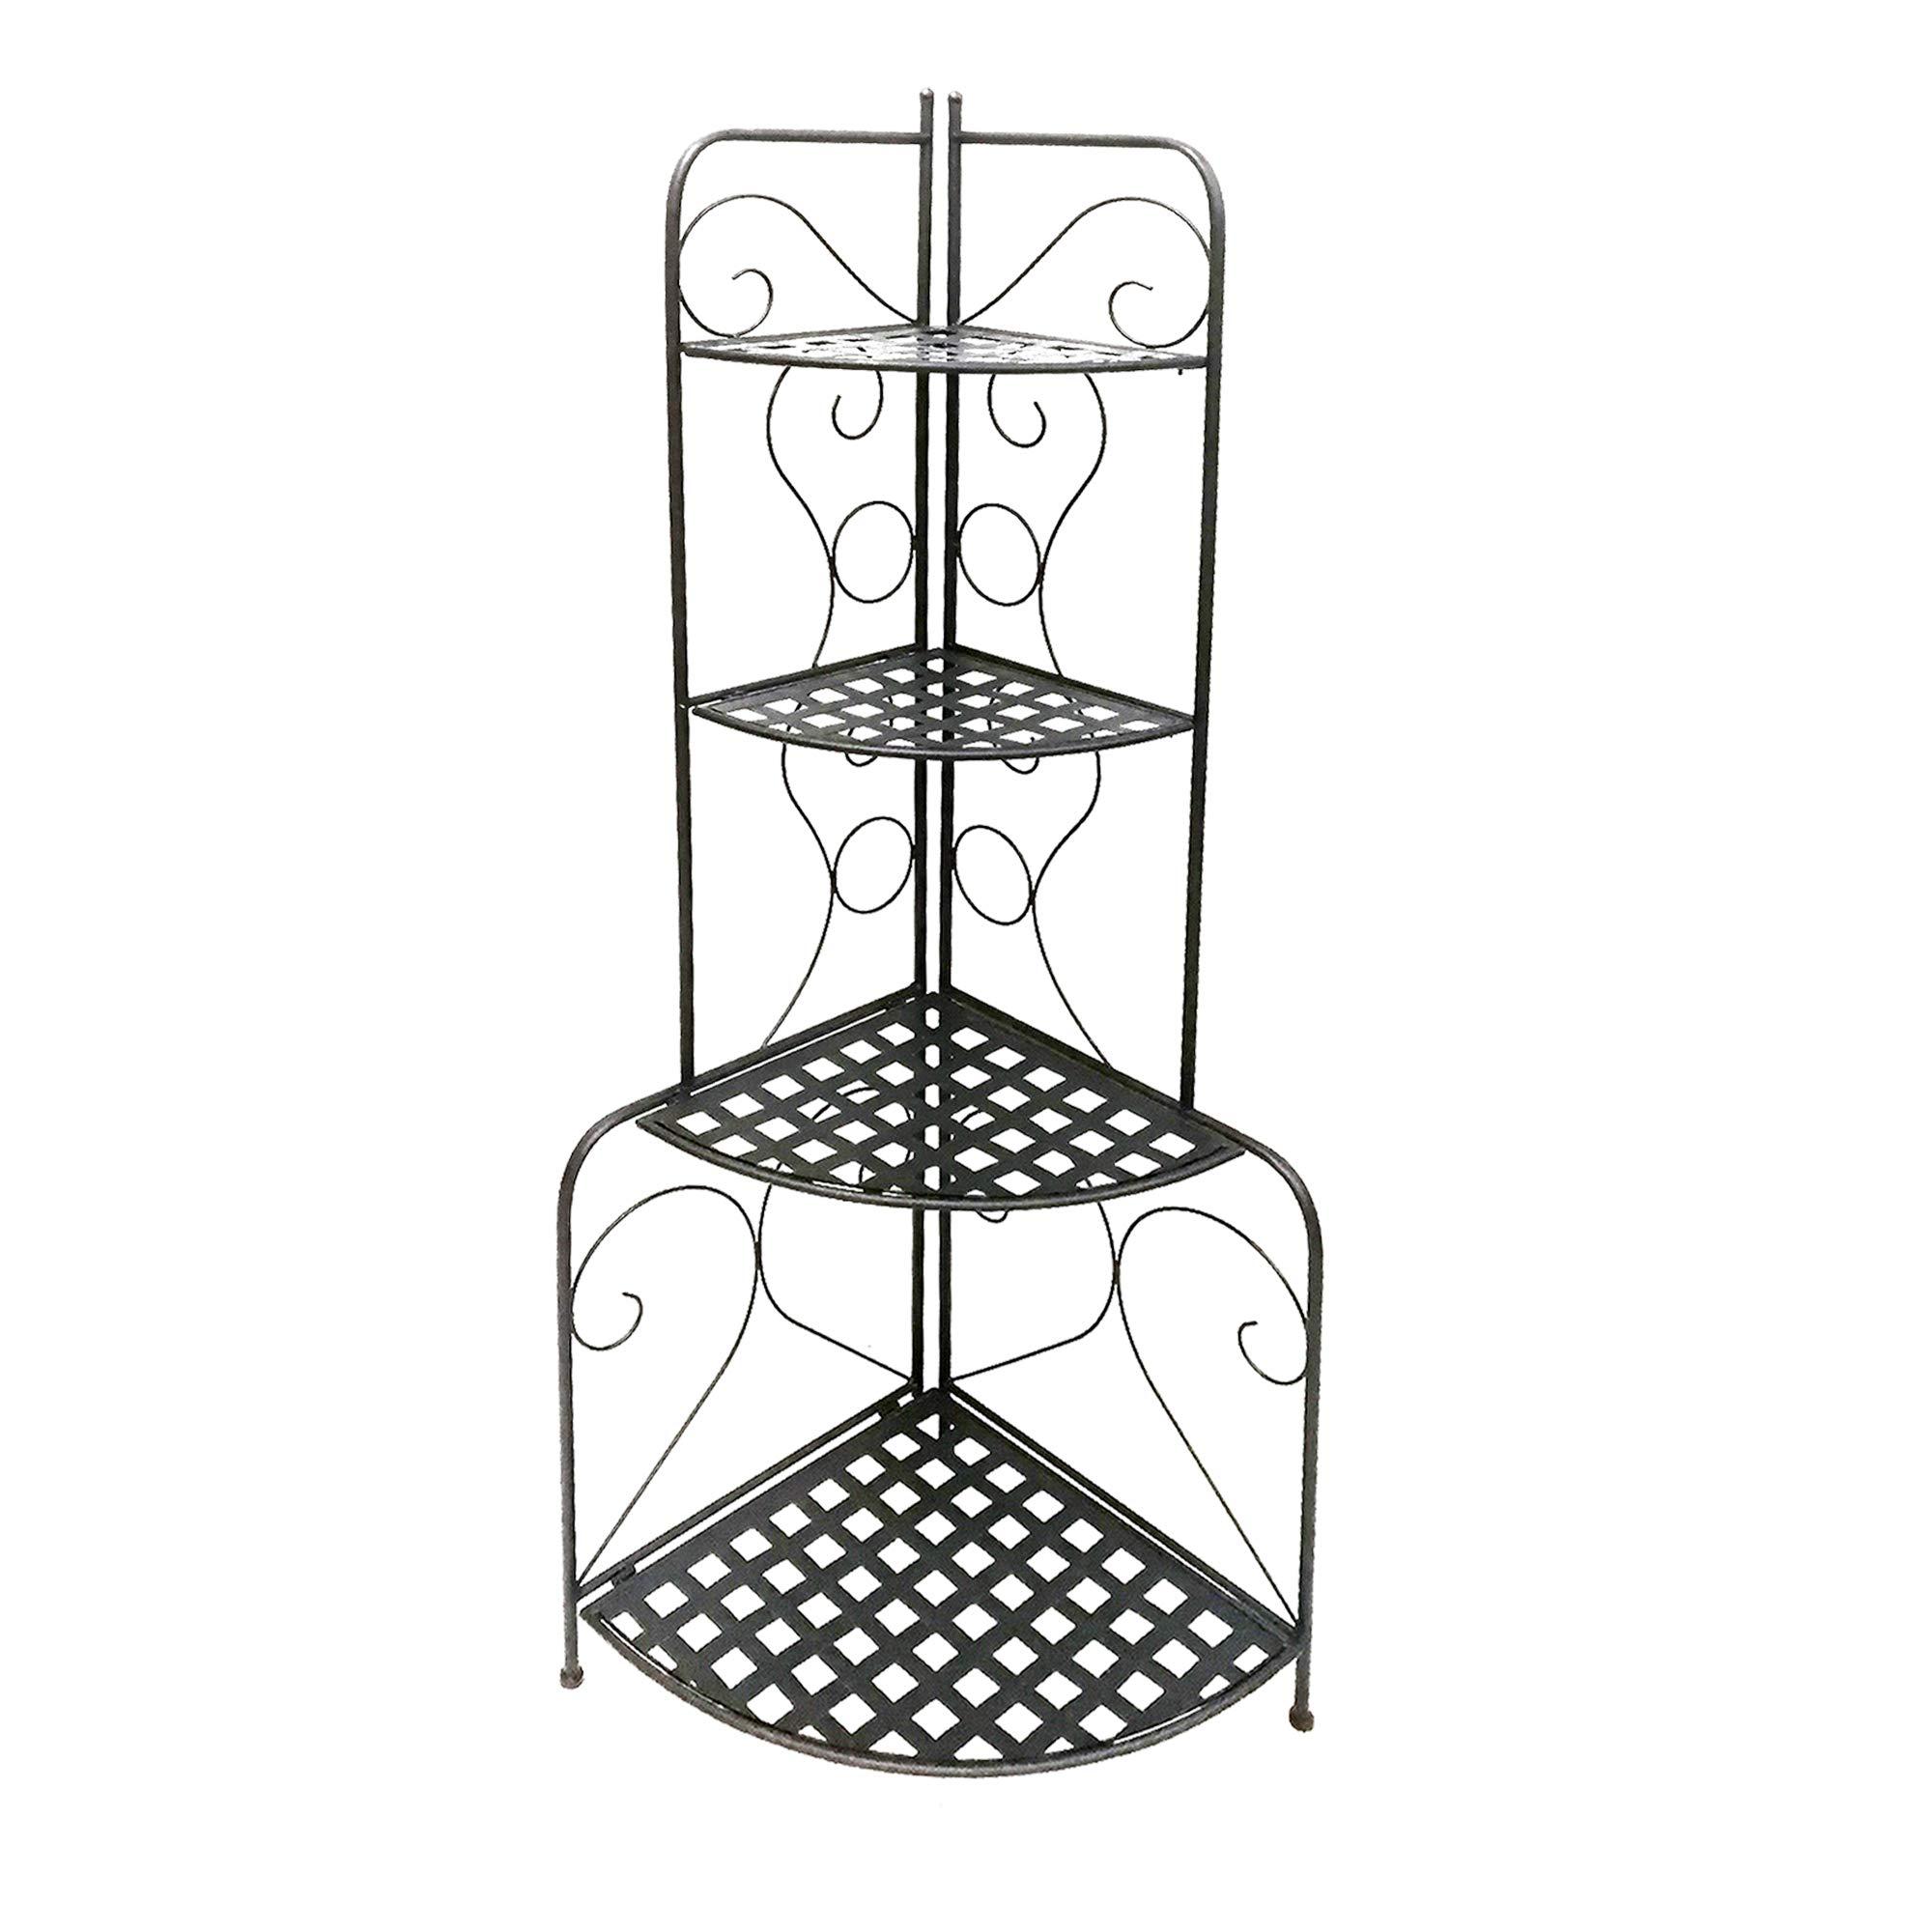 Benjara , Black Scrolled Accent Metal Foldable Corner Rack with Mesh Design Storage Shelves by Benjara